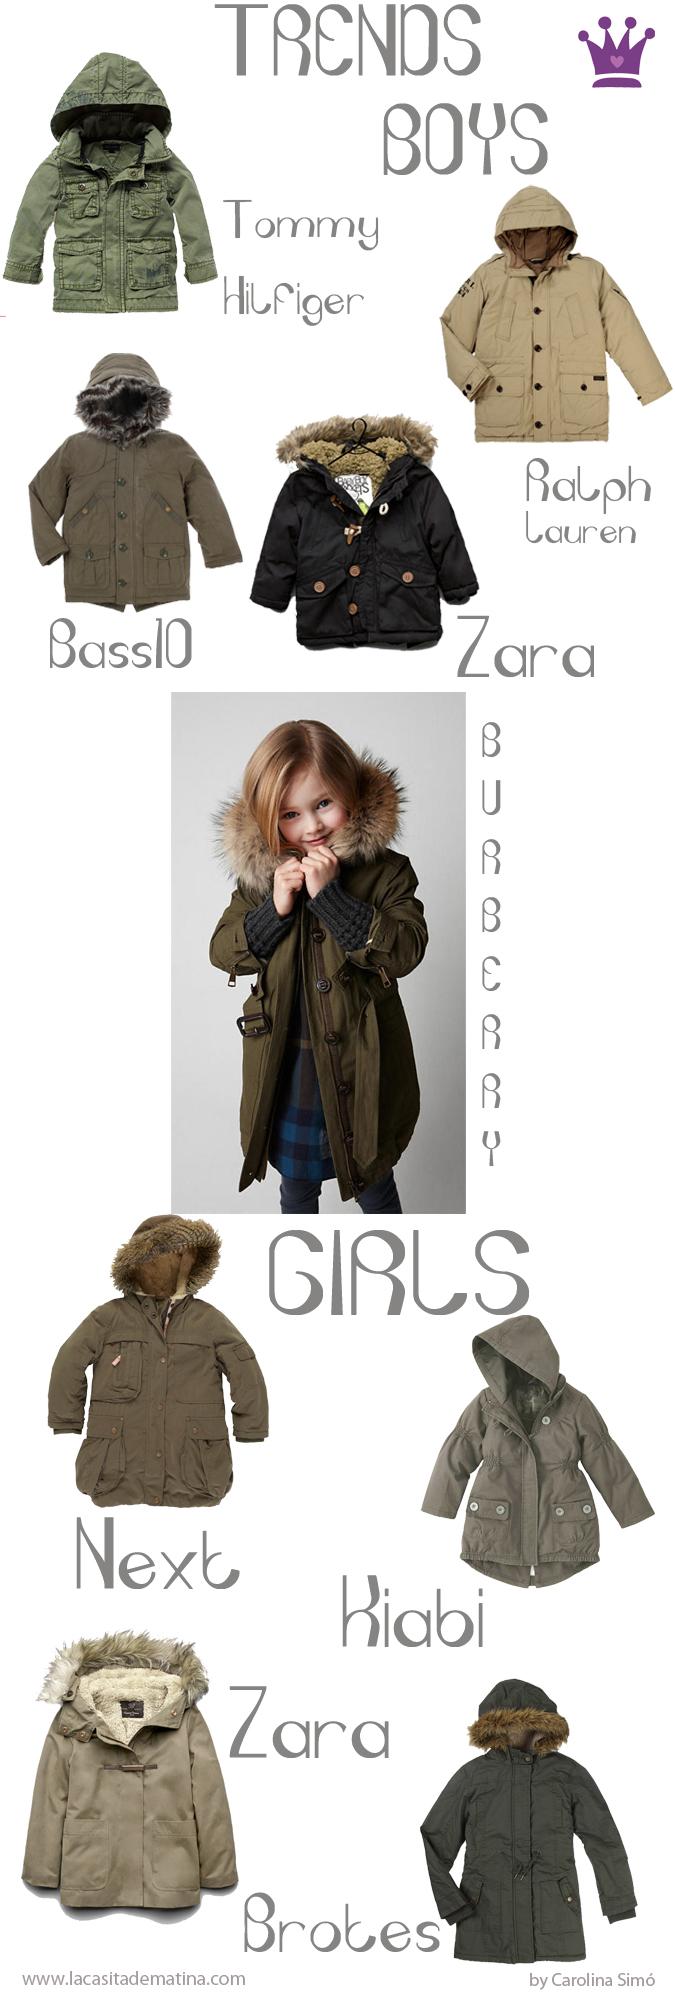 Parka Tendencias Moda Infantil, Blog de Moda Infantil   La casita de Martina